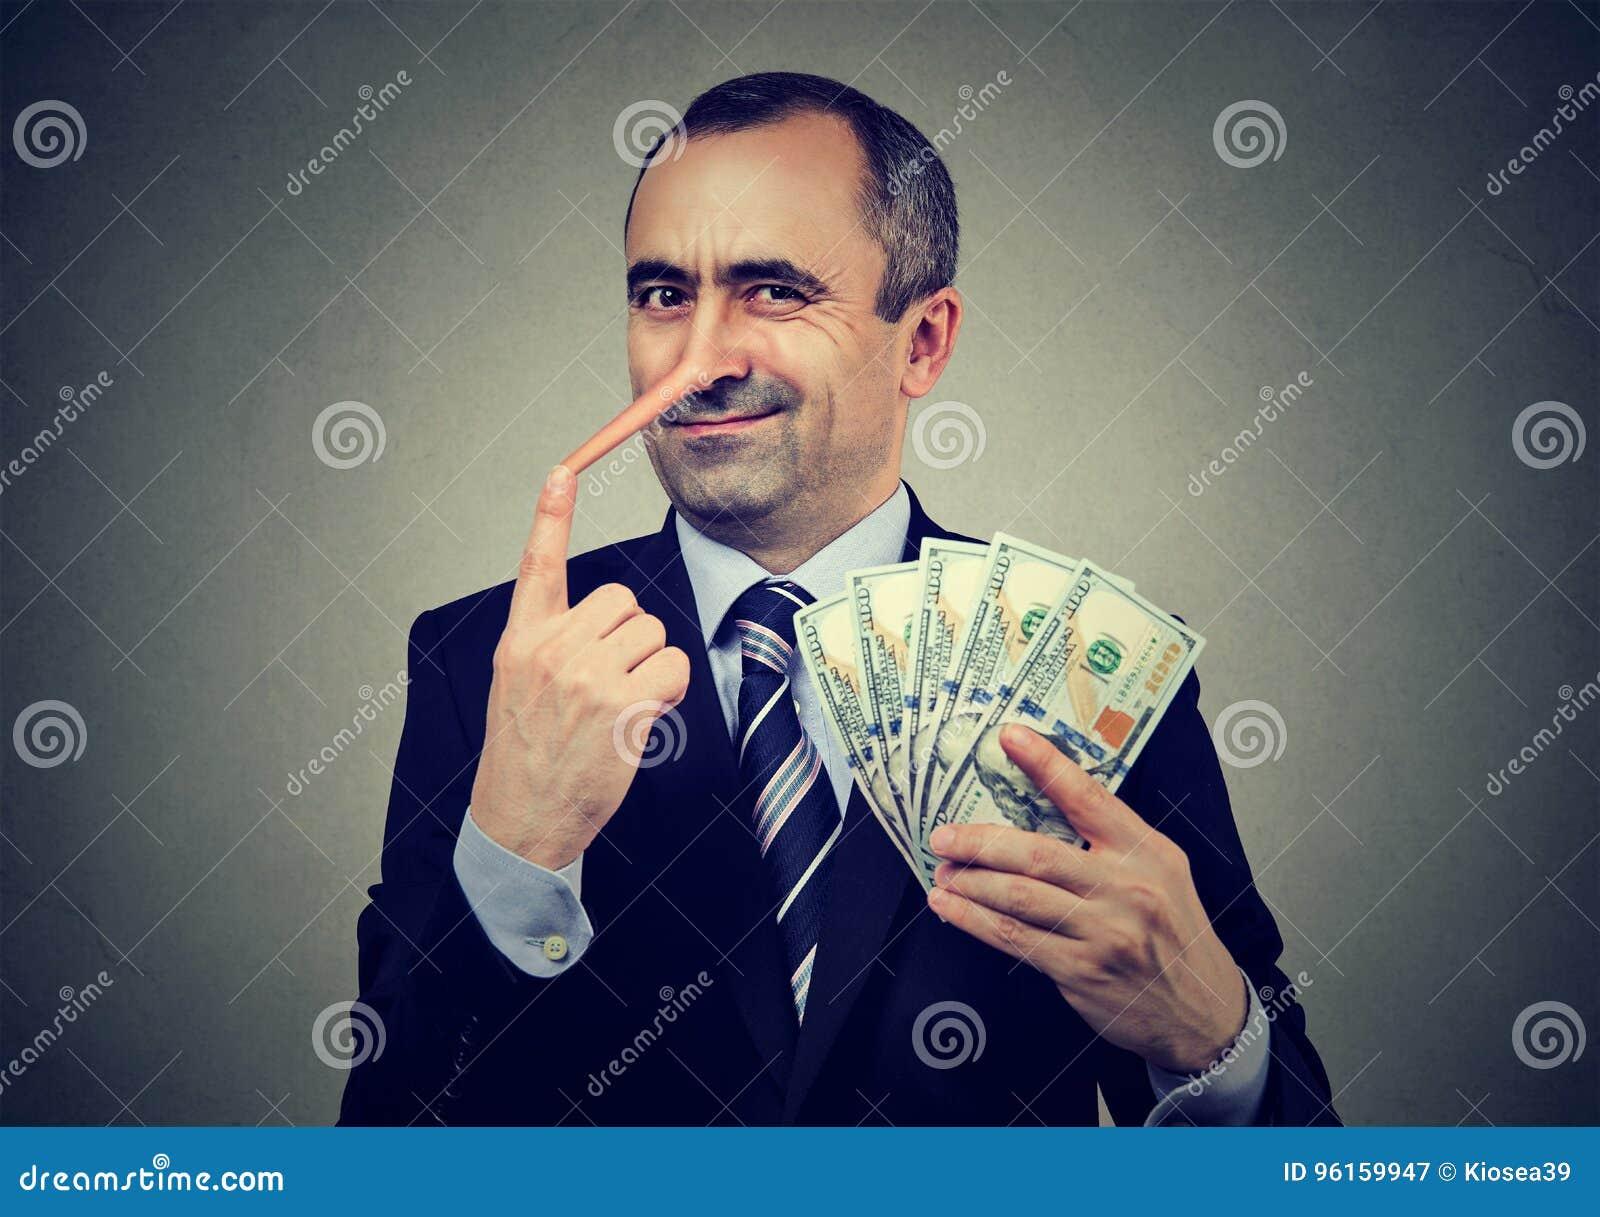 Financial fraud concept. Liar businessman executive with dollar cash